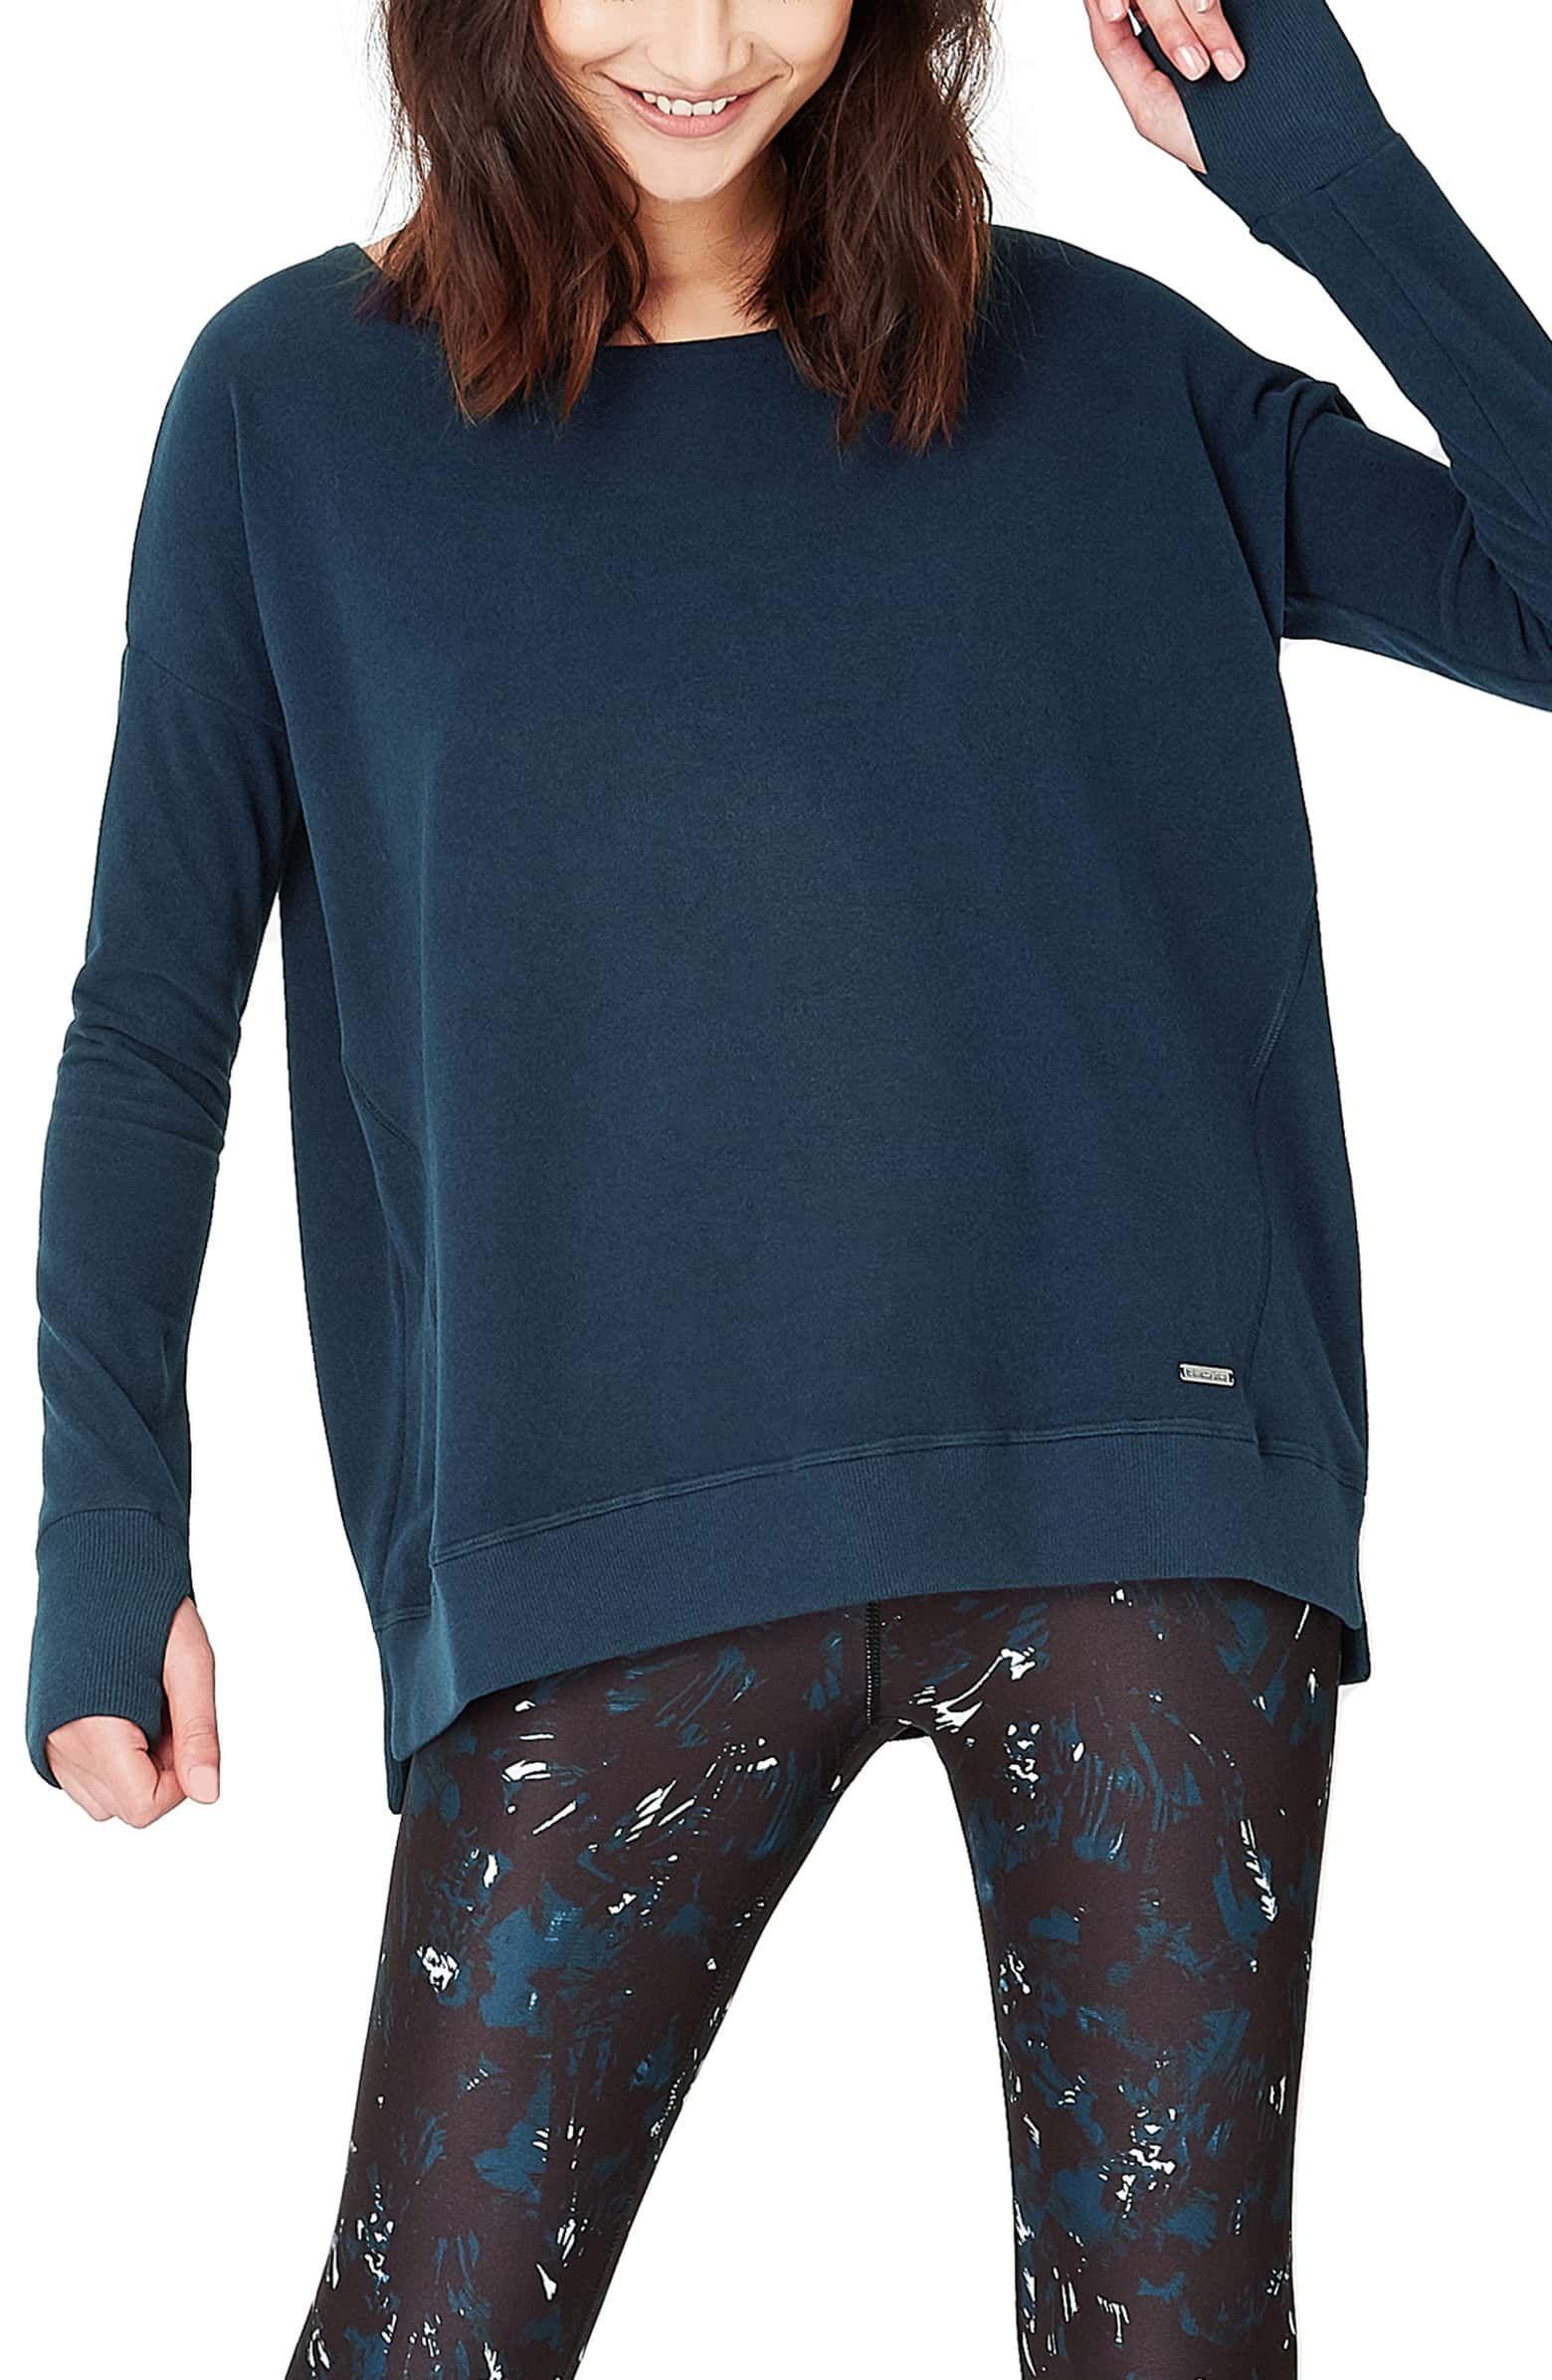 sweaty betty luxe simhasana sweatshirt